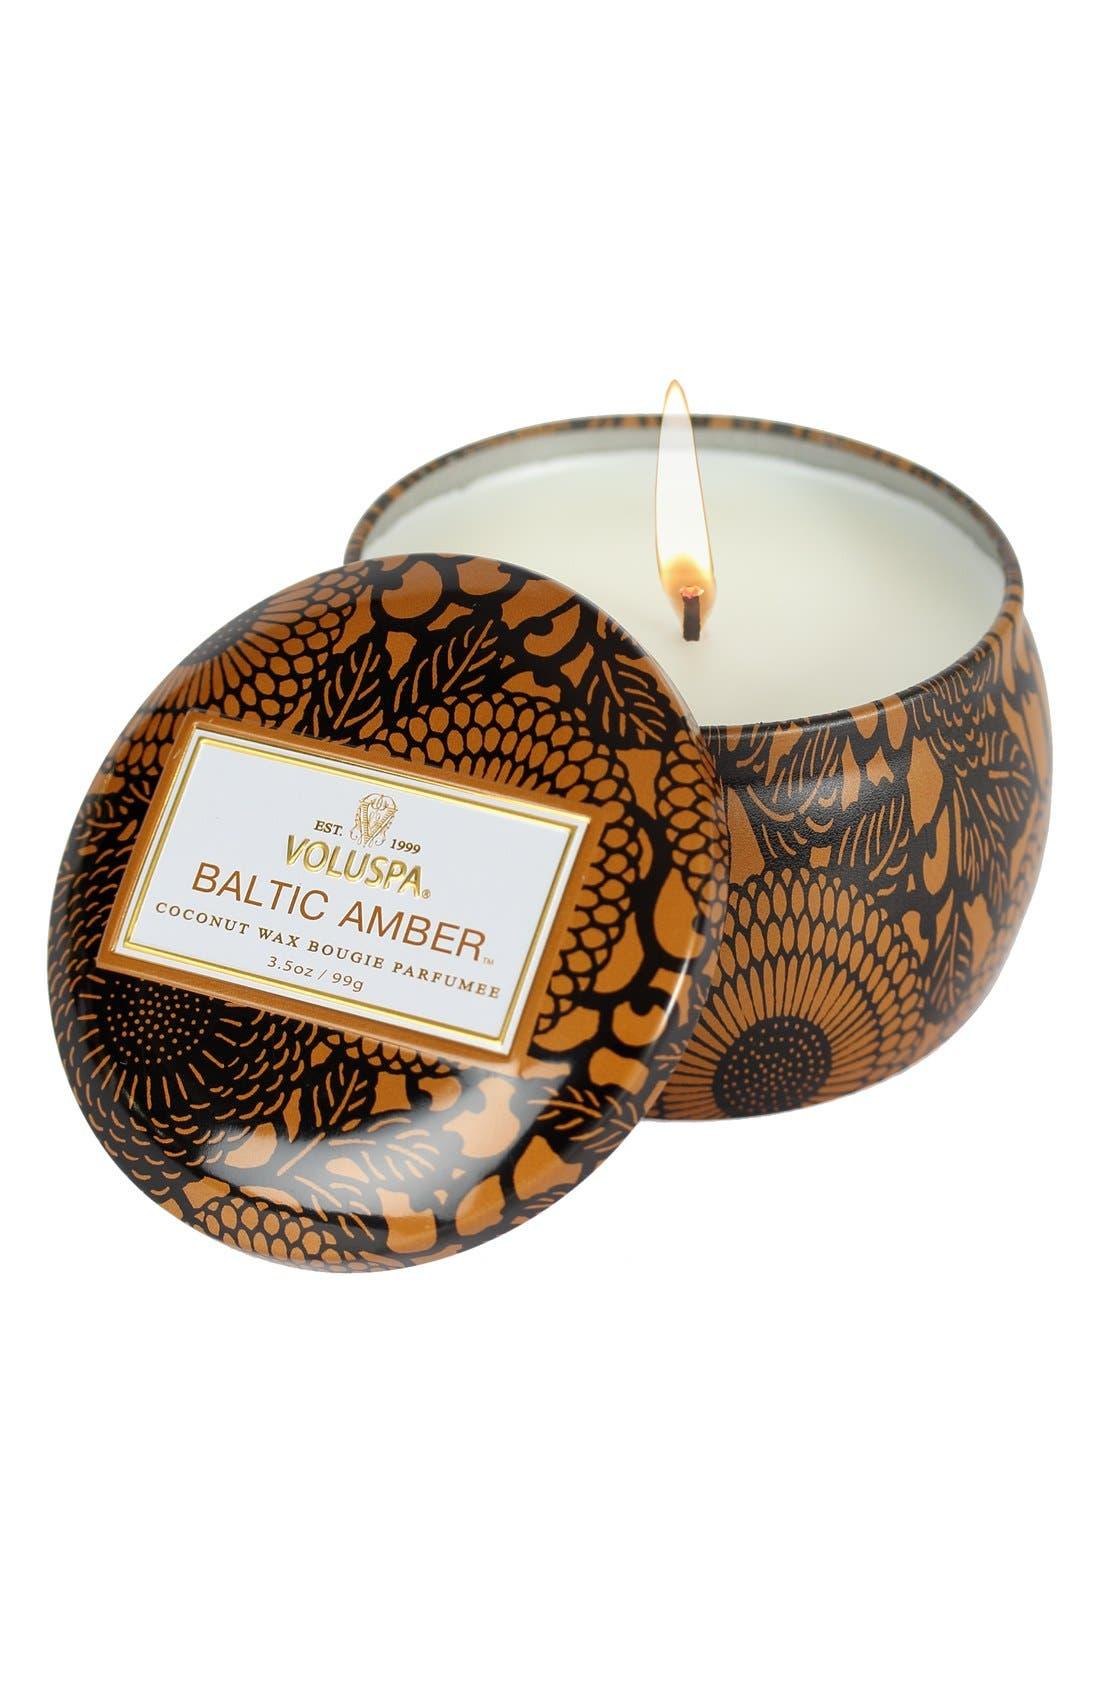 Main Image - Voluspa 'Japonica - Baltic Amber' Petite Decorative Candle